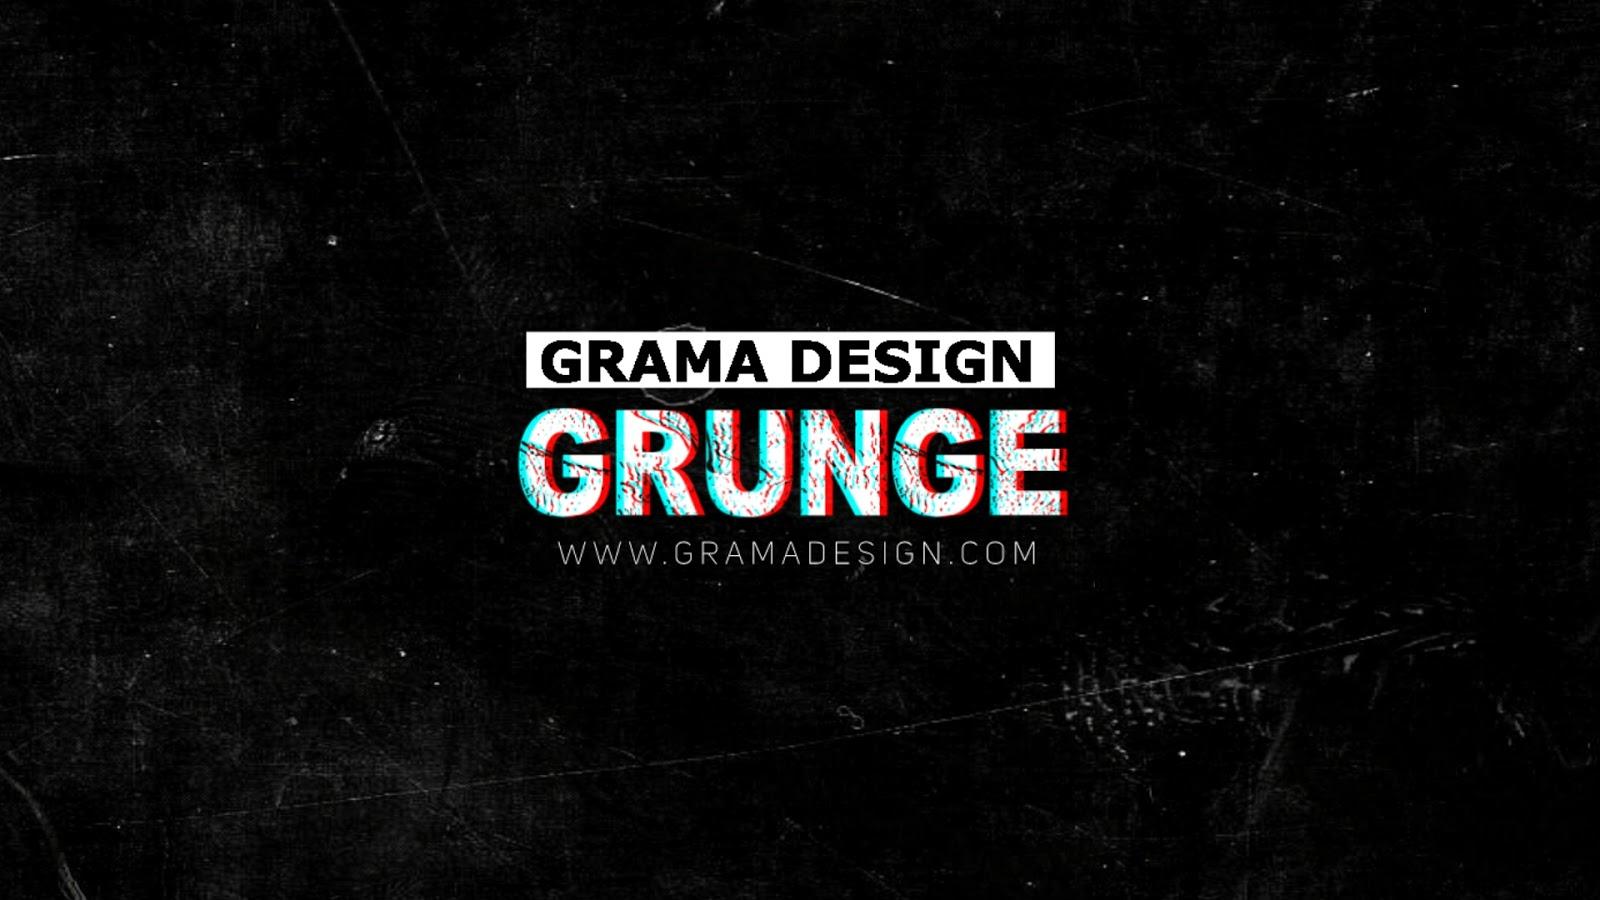 Grunge Glitch Logo | FREE Intro Template Sony Vegas PRO (4k) - GRAMA ...